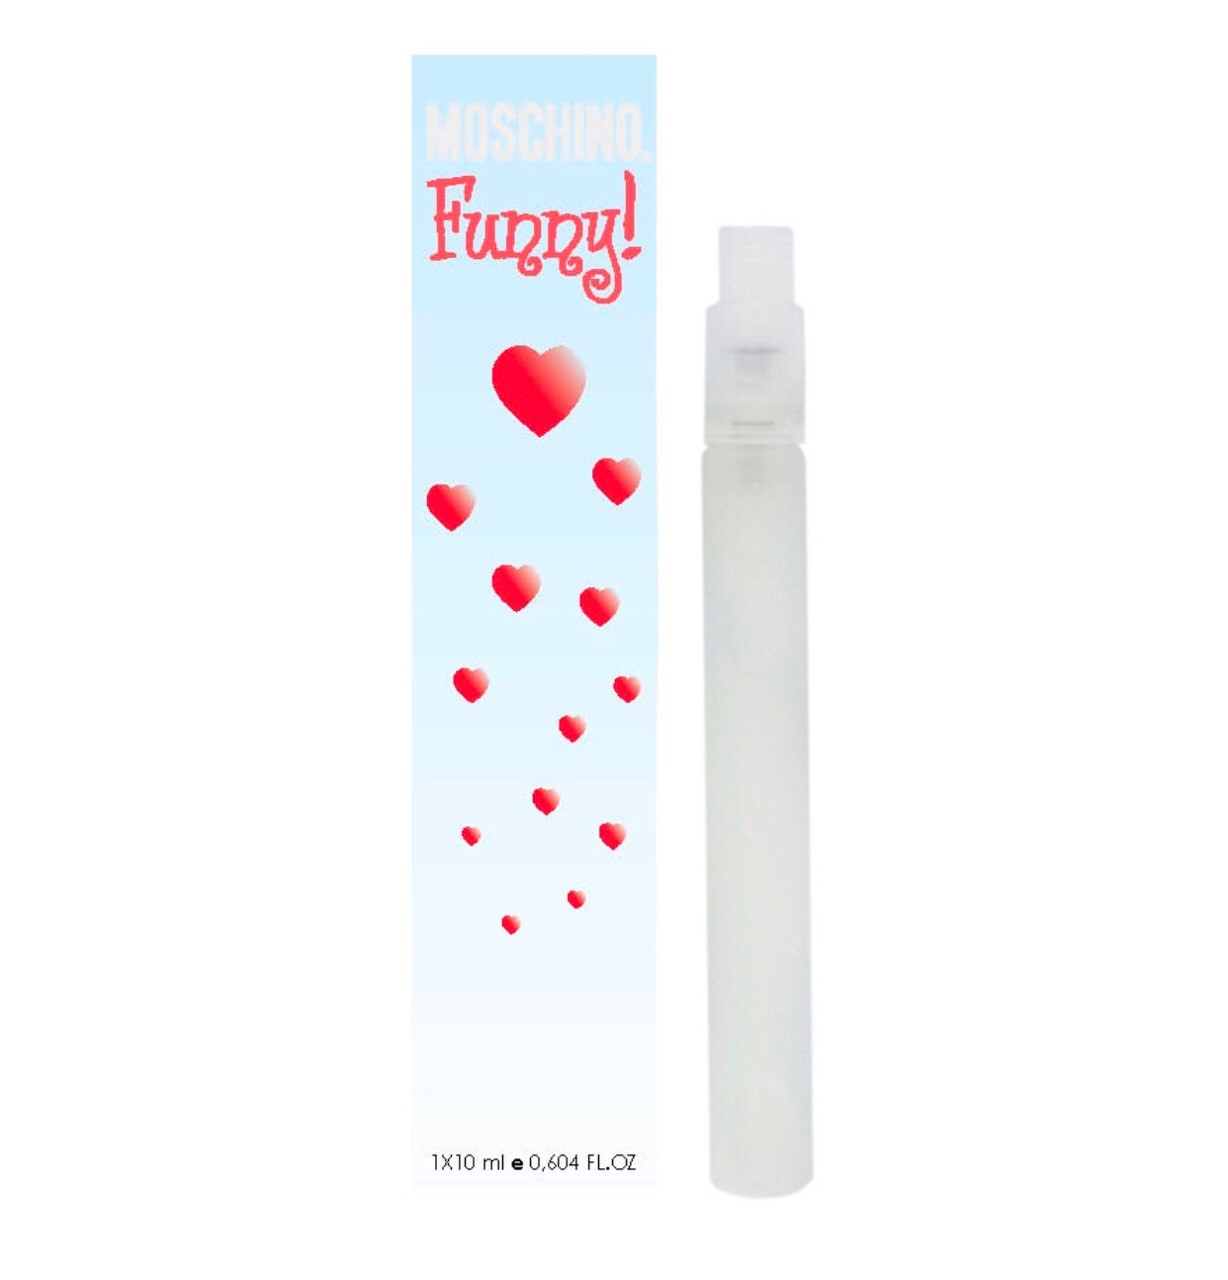 Мини-парфюм женский Moschino Funny! (10 мл)